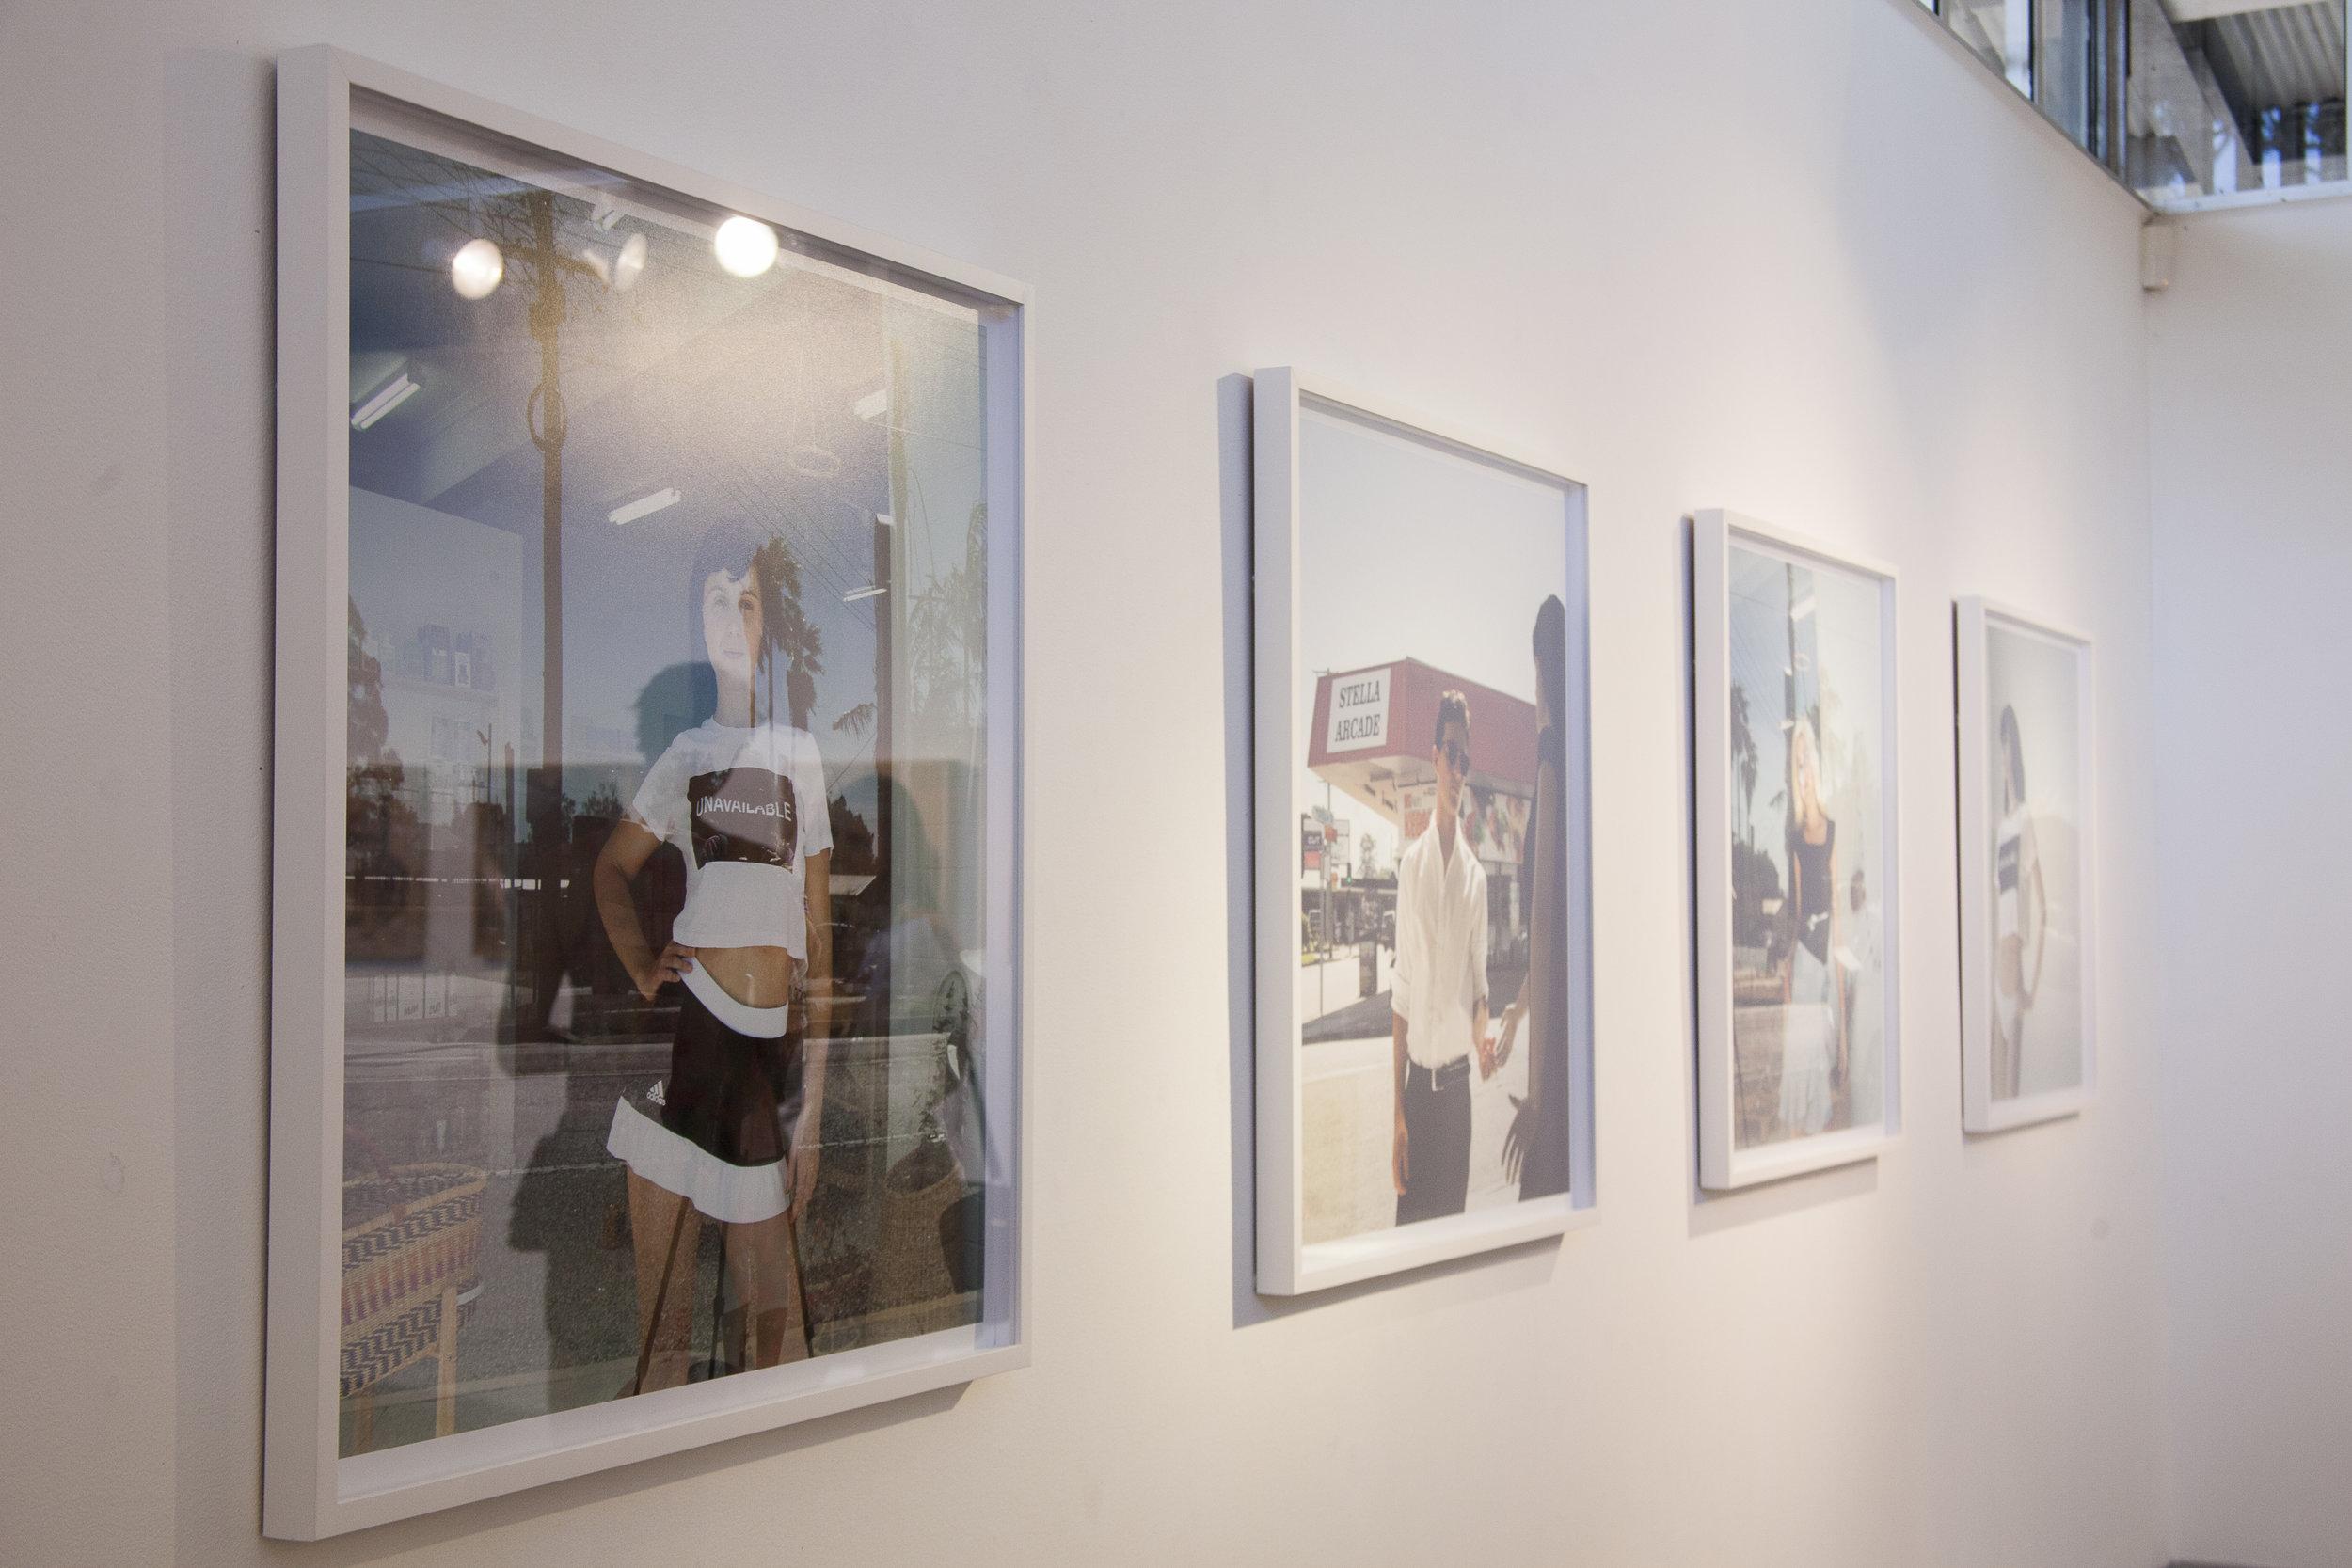 Honours Graduation Exhibition Uni Gallery 9.12.17 high-3775.JPG